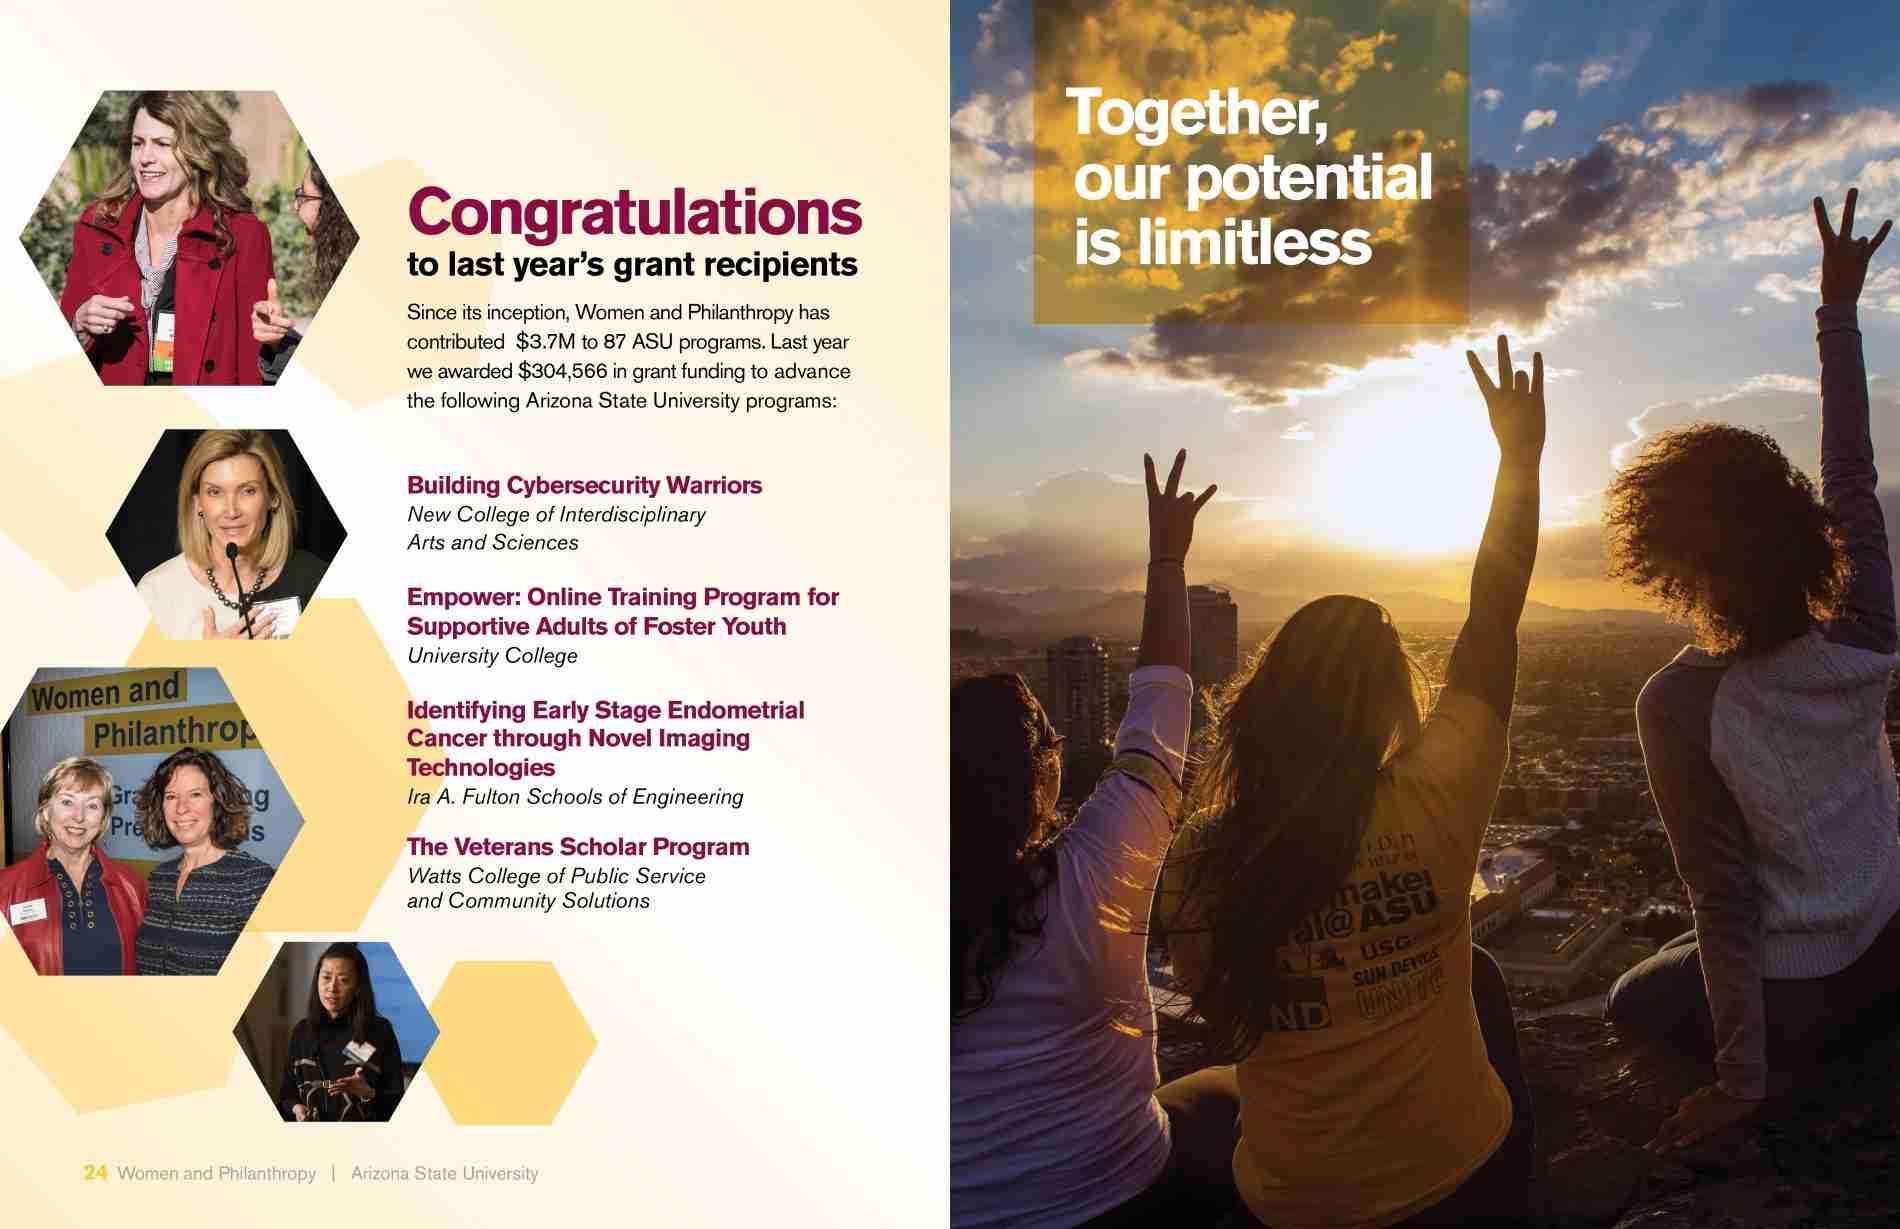 ASU-Women-Philanthropy-grant-funding-booklet_06